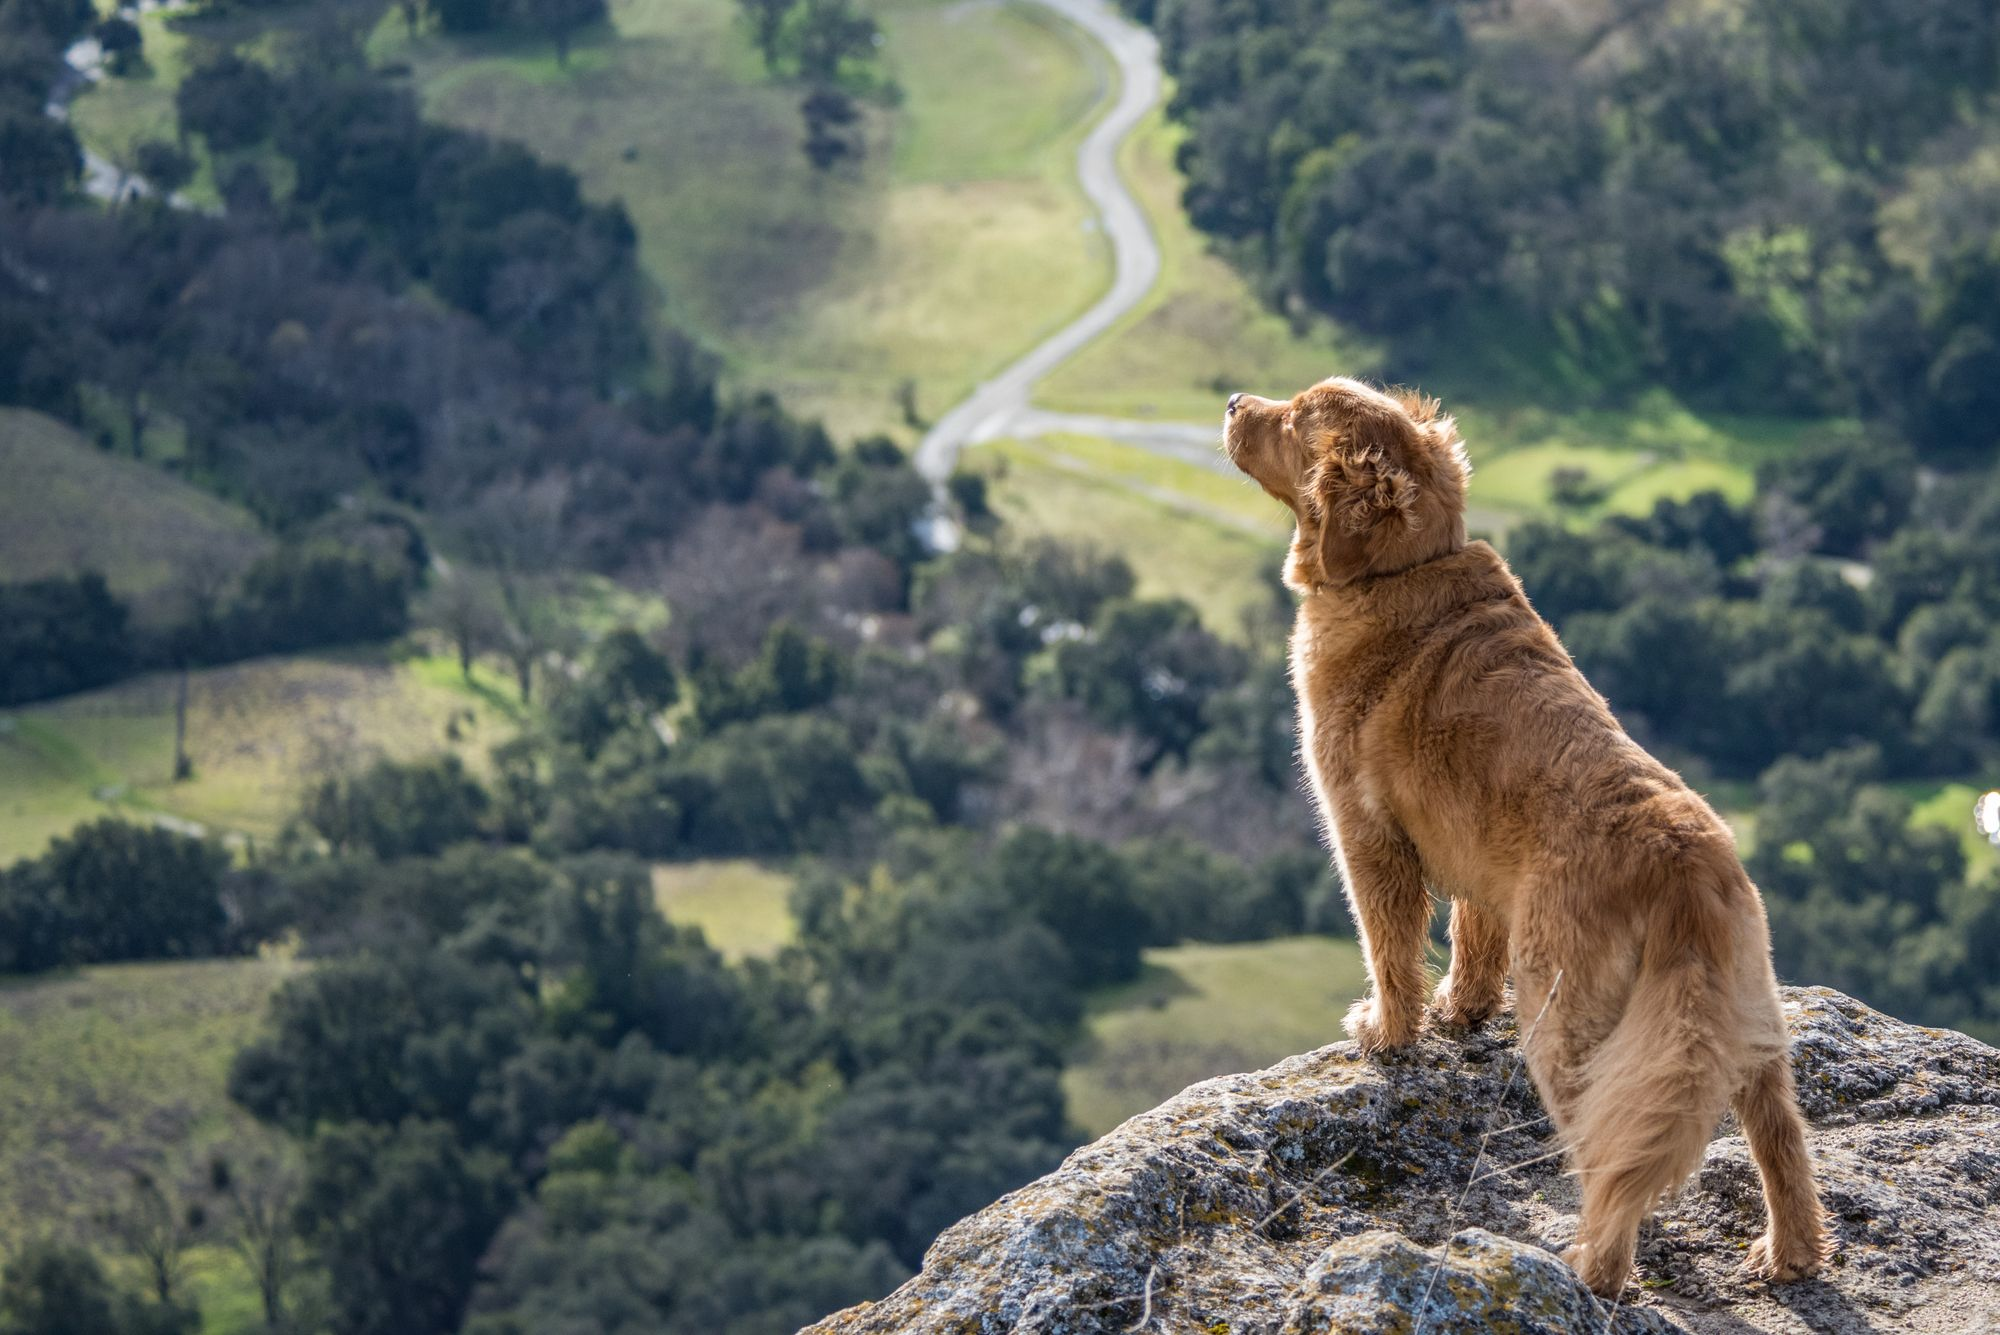 hiking-dog-unsplash-source